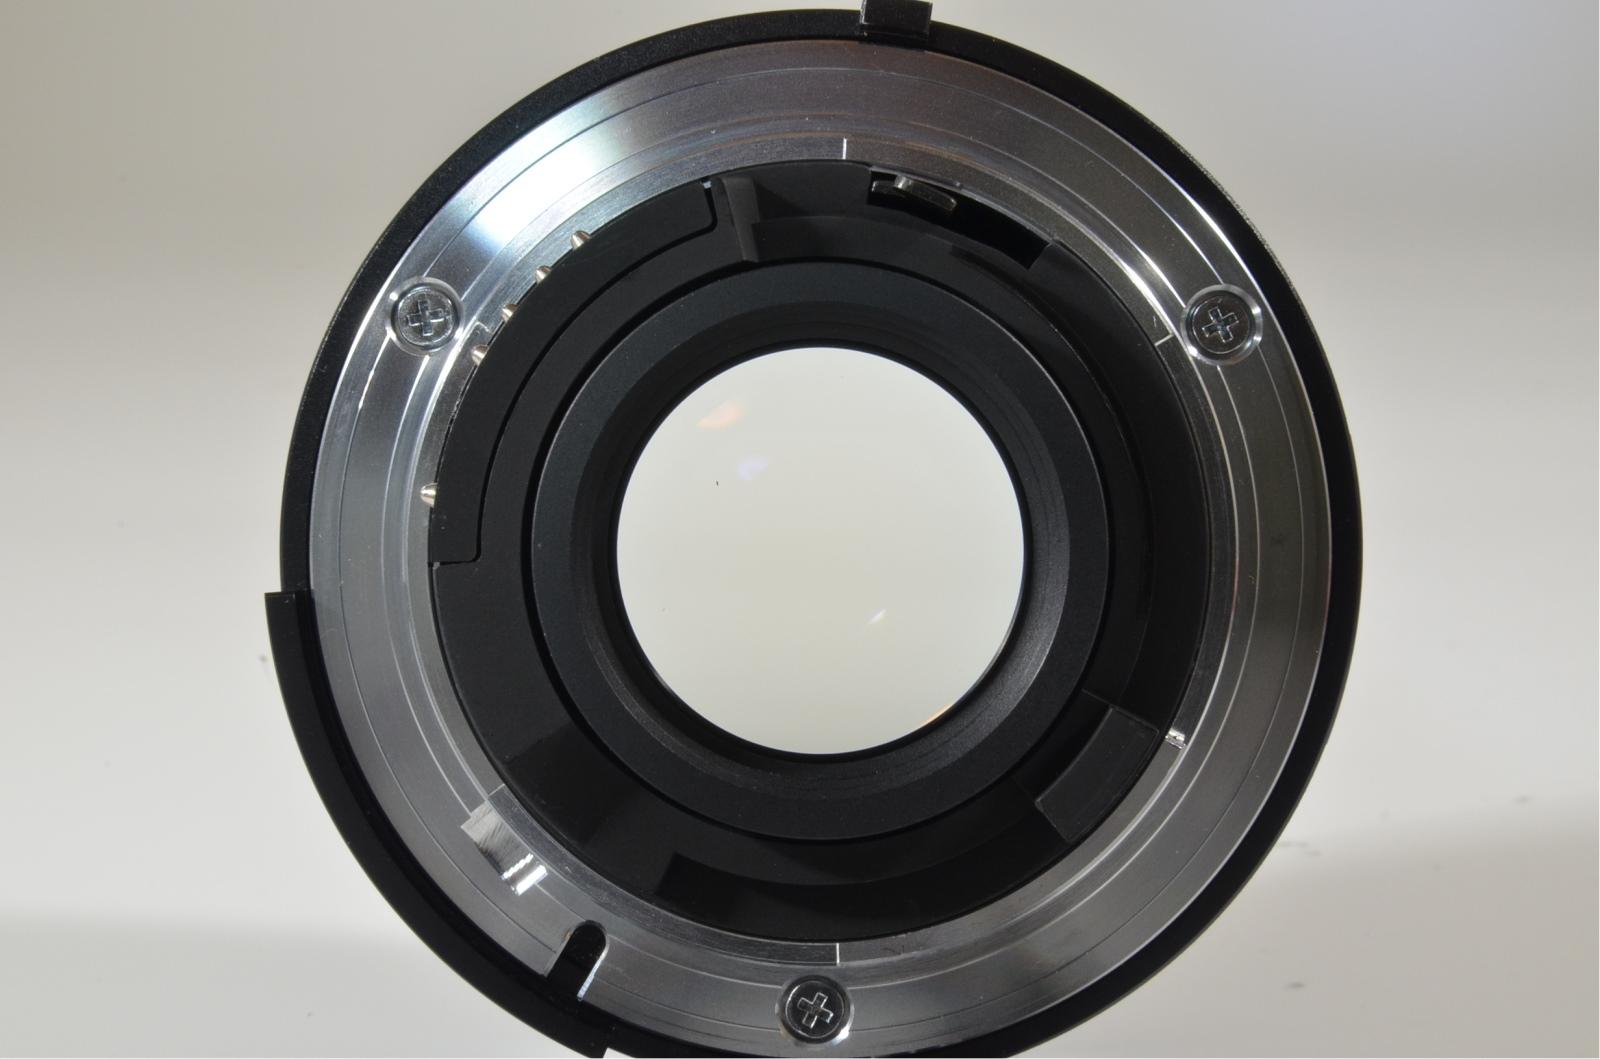 voigtlander ultron 40mm f/2 sl ii for nikon ai-s